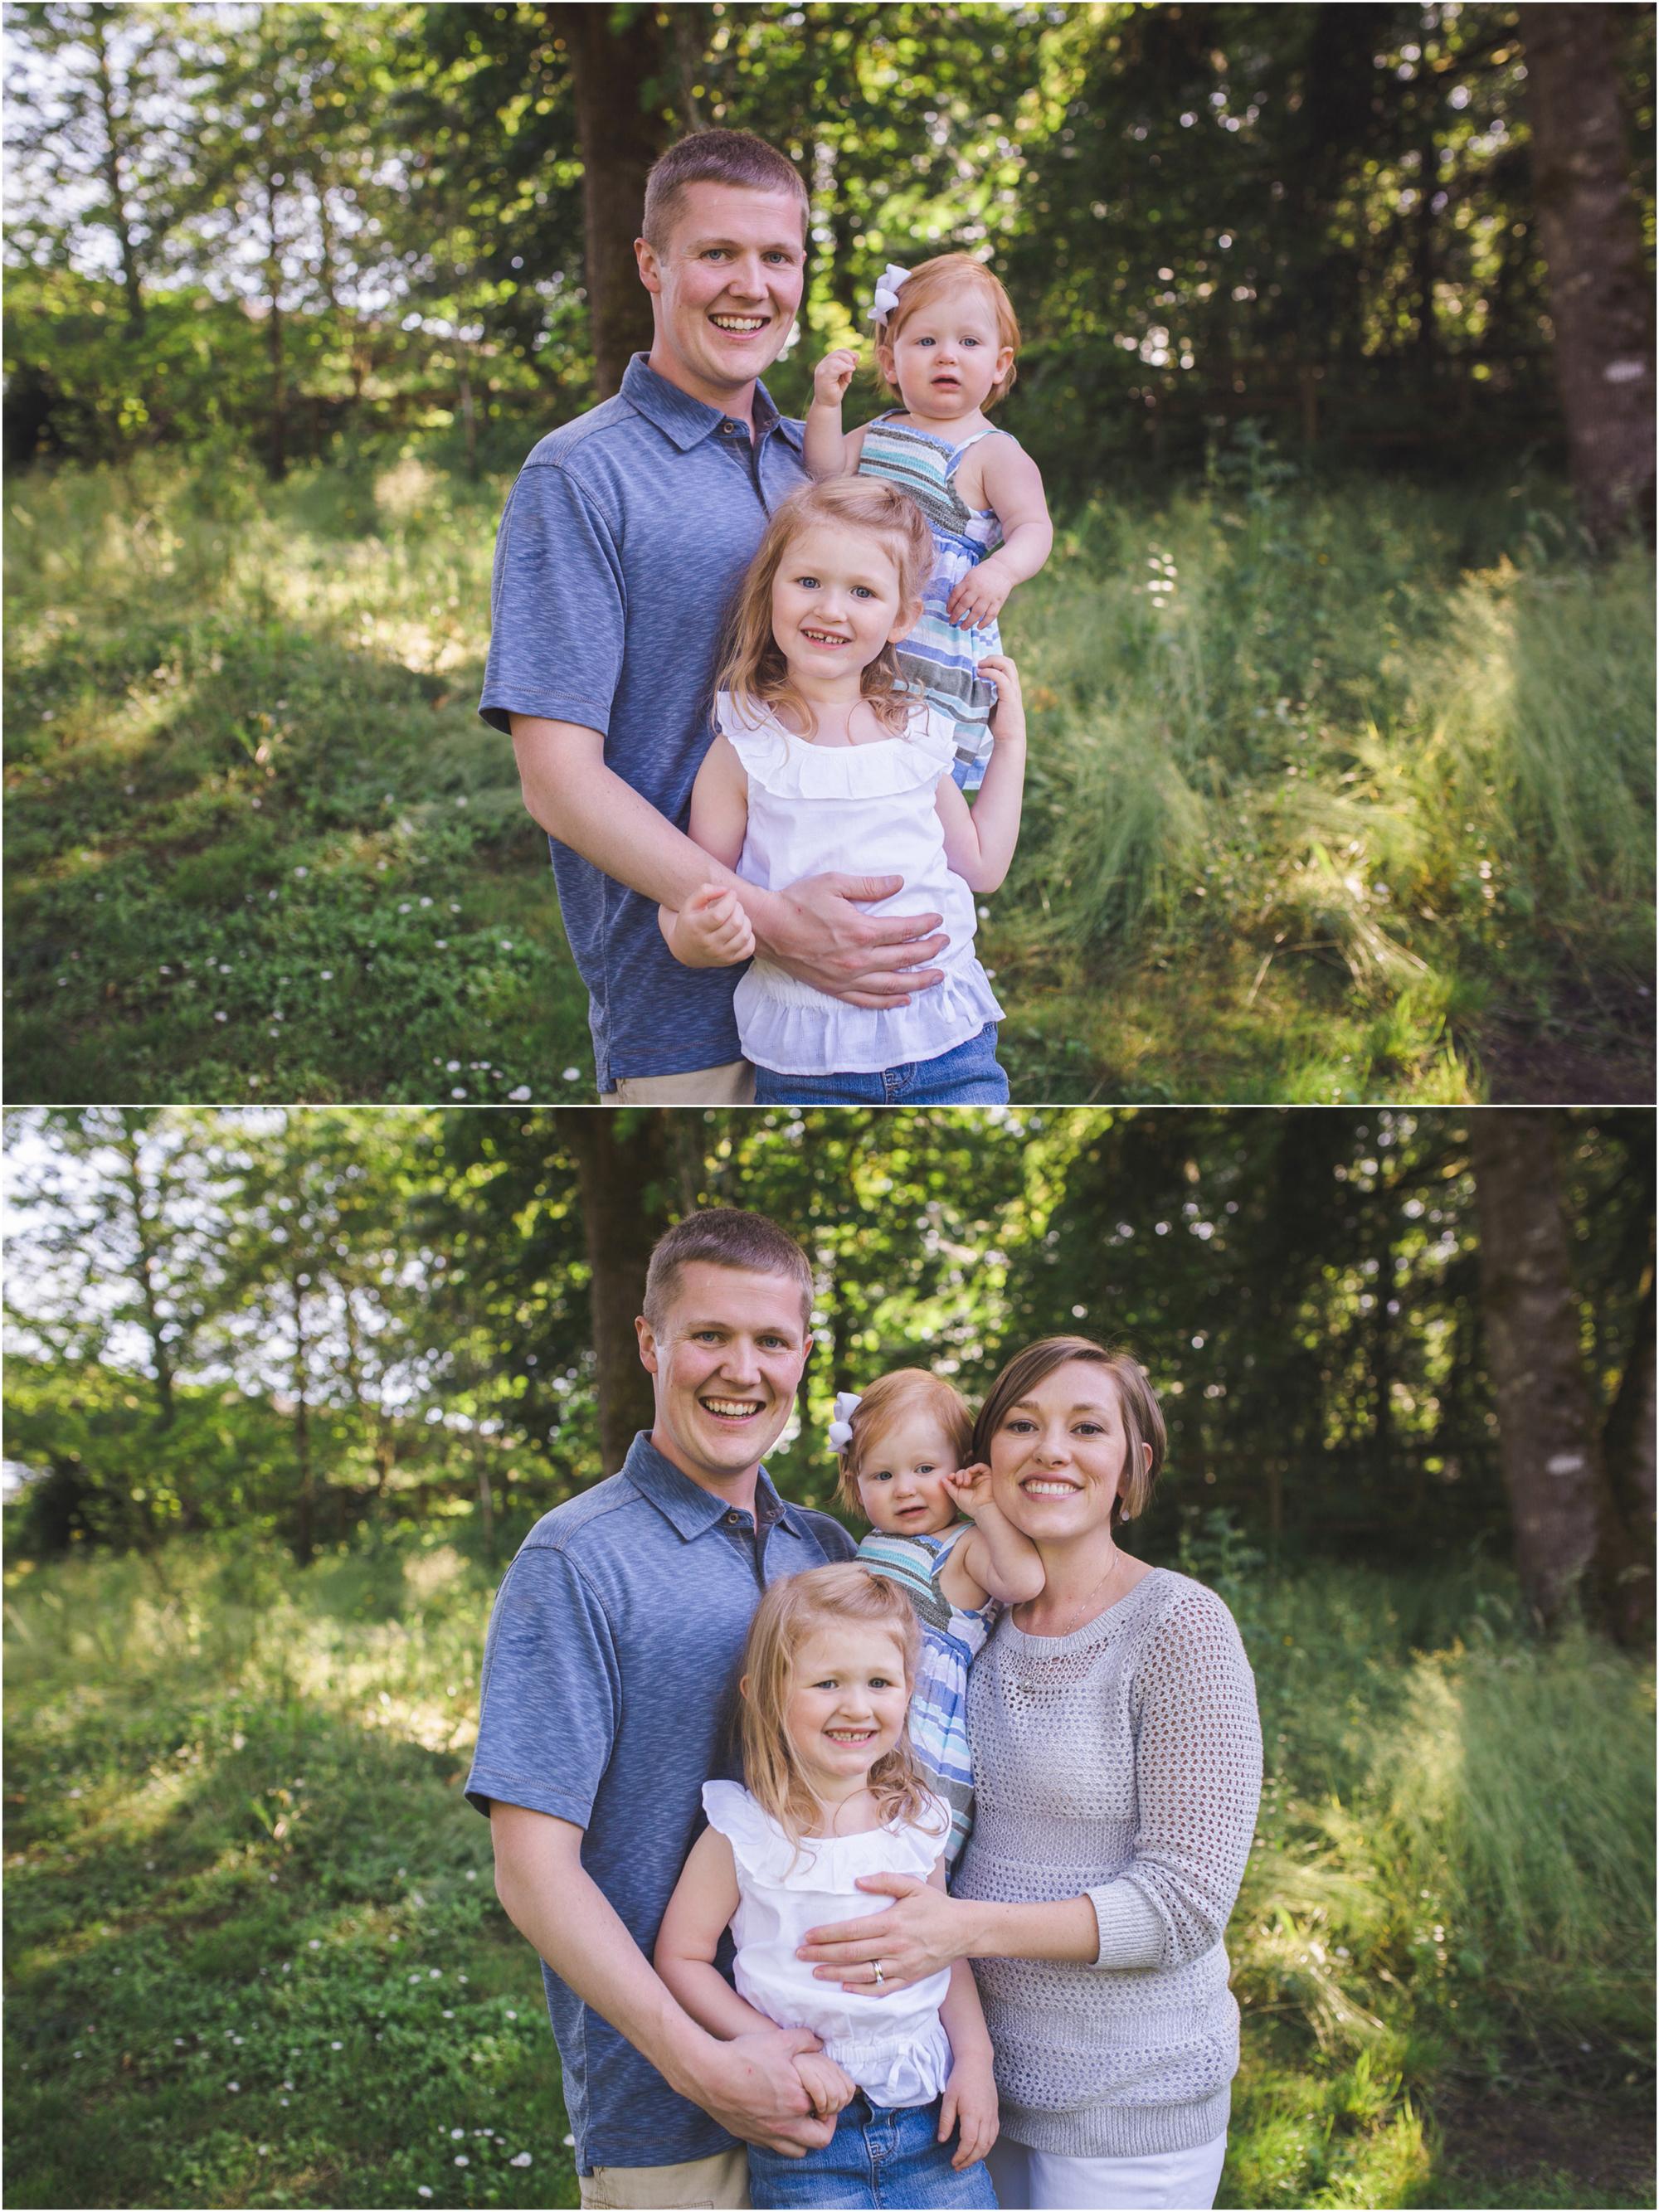 ashley vos photography seattle lifestyle family photographer_0295.jpg